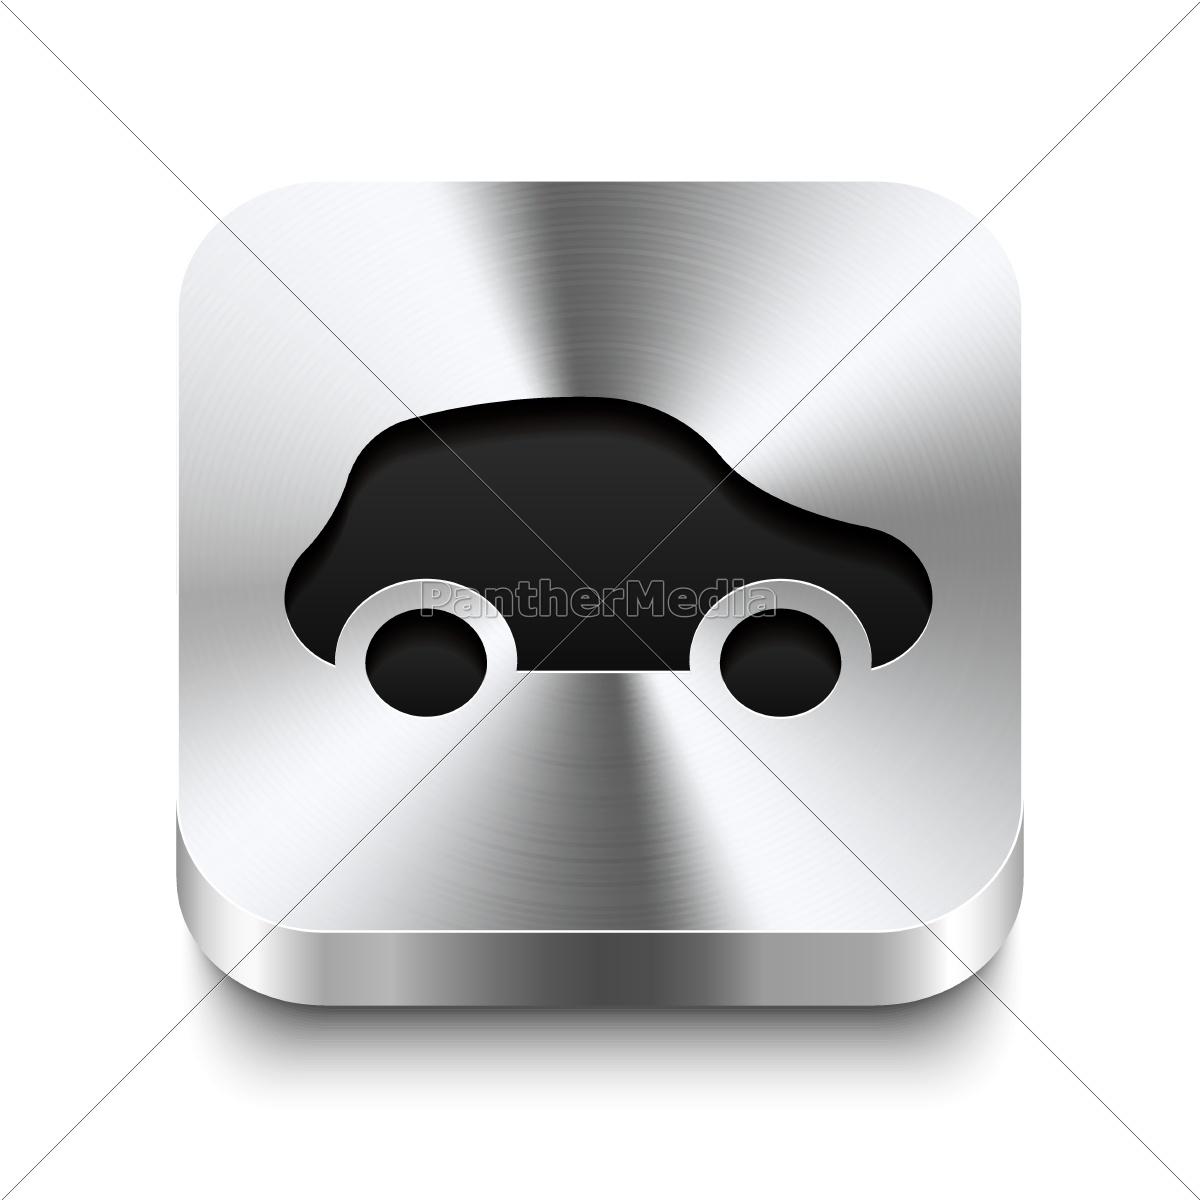 square, metal, button, perspektive, -, car - 10197223